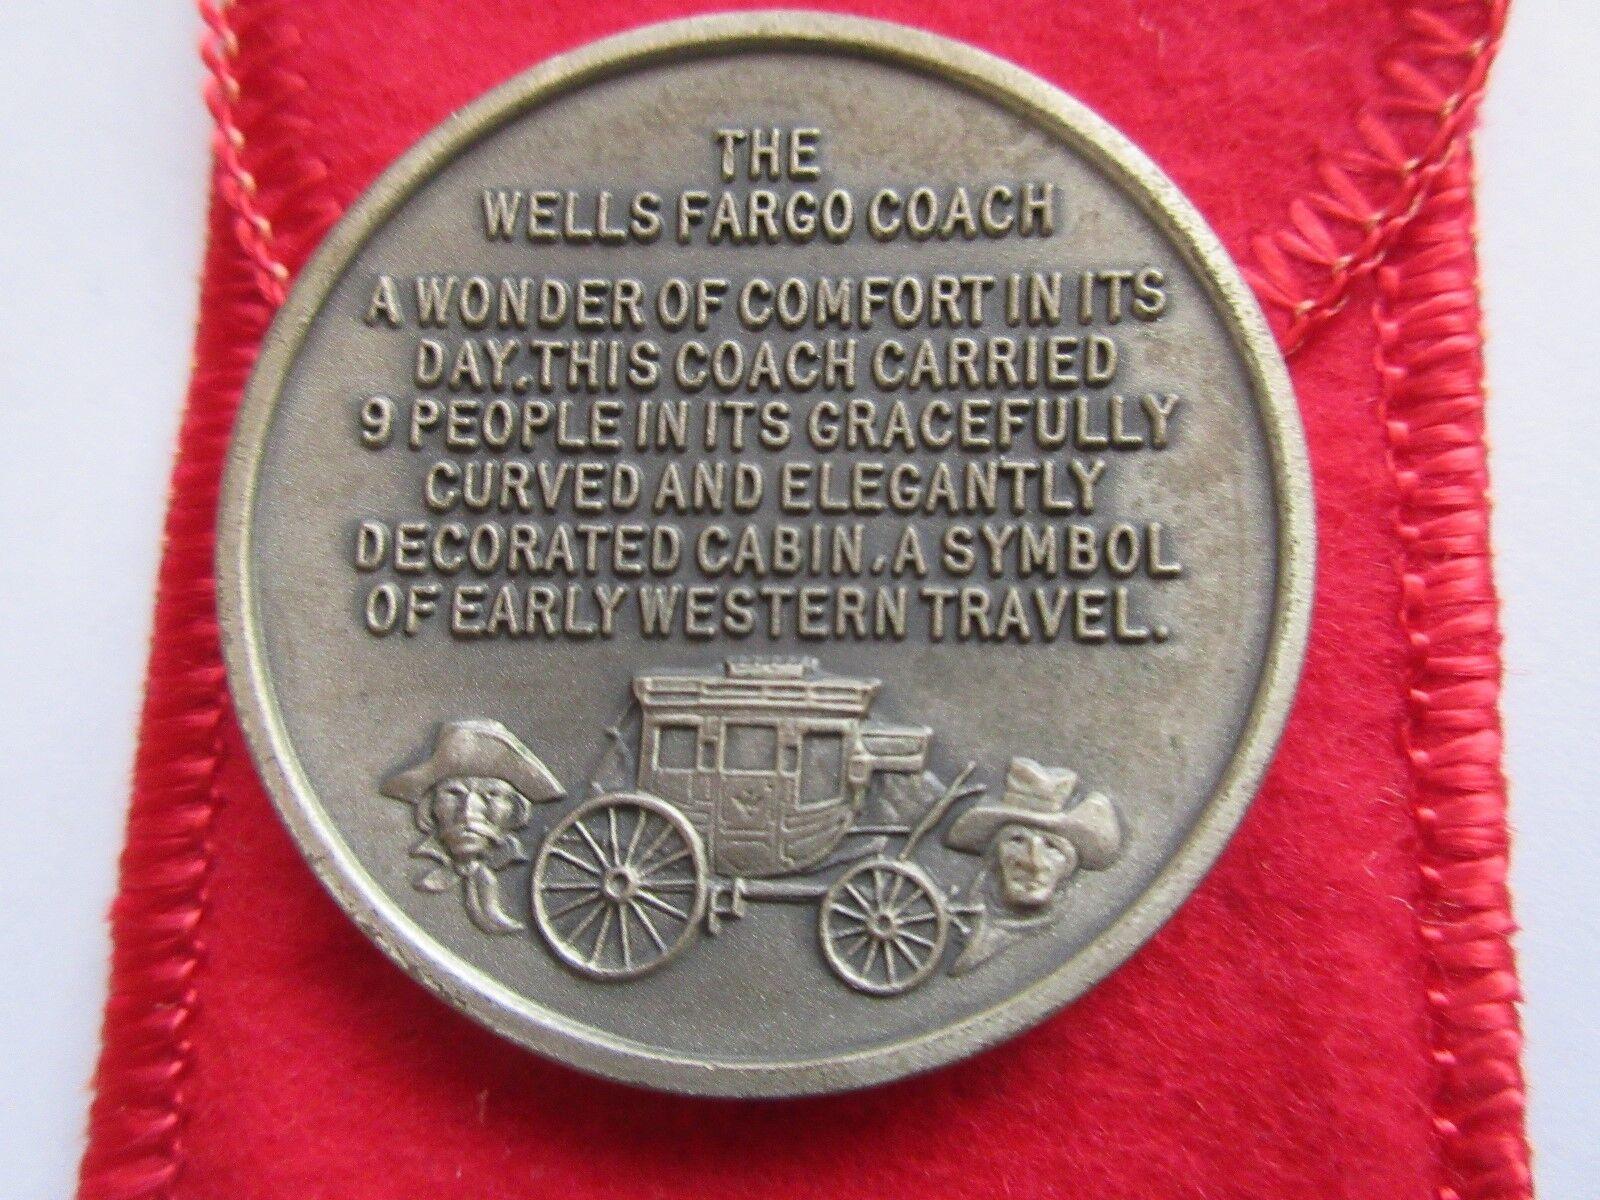 Wells Fargo Coach , Longines-Wittnauer , Sterling Serie